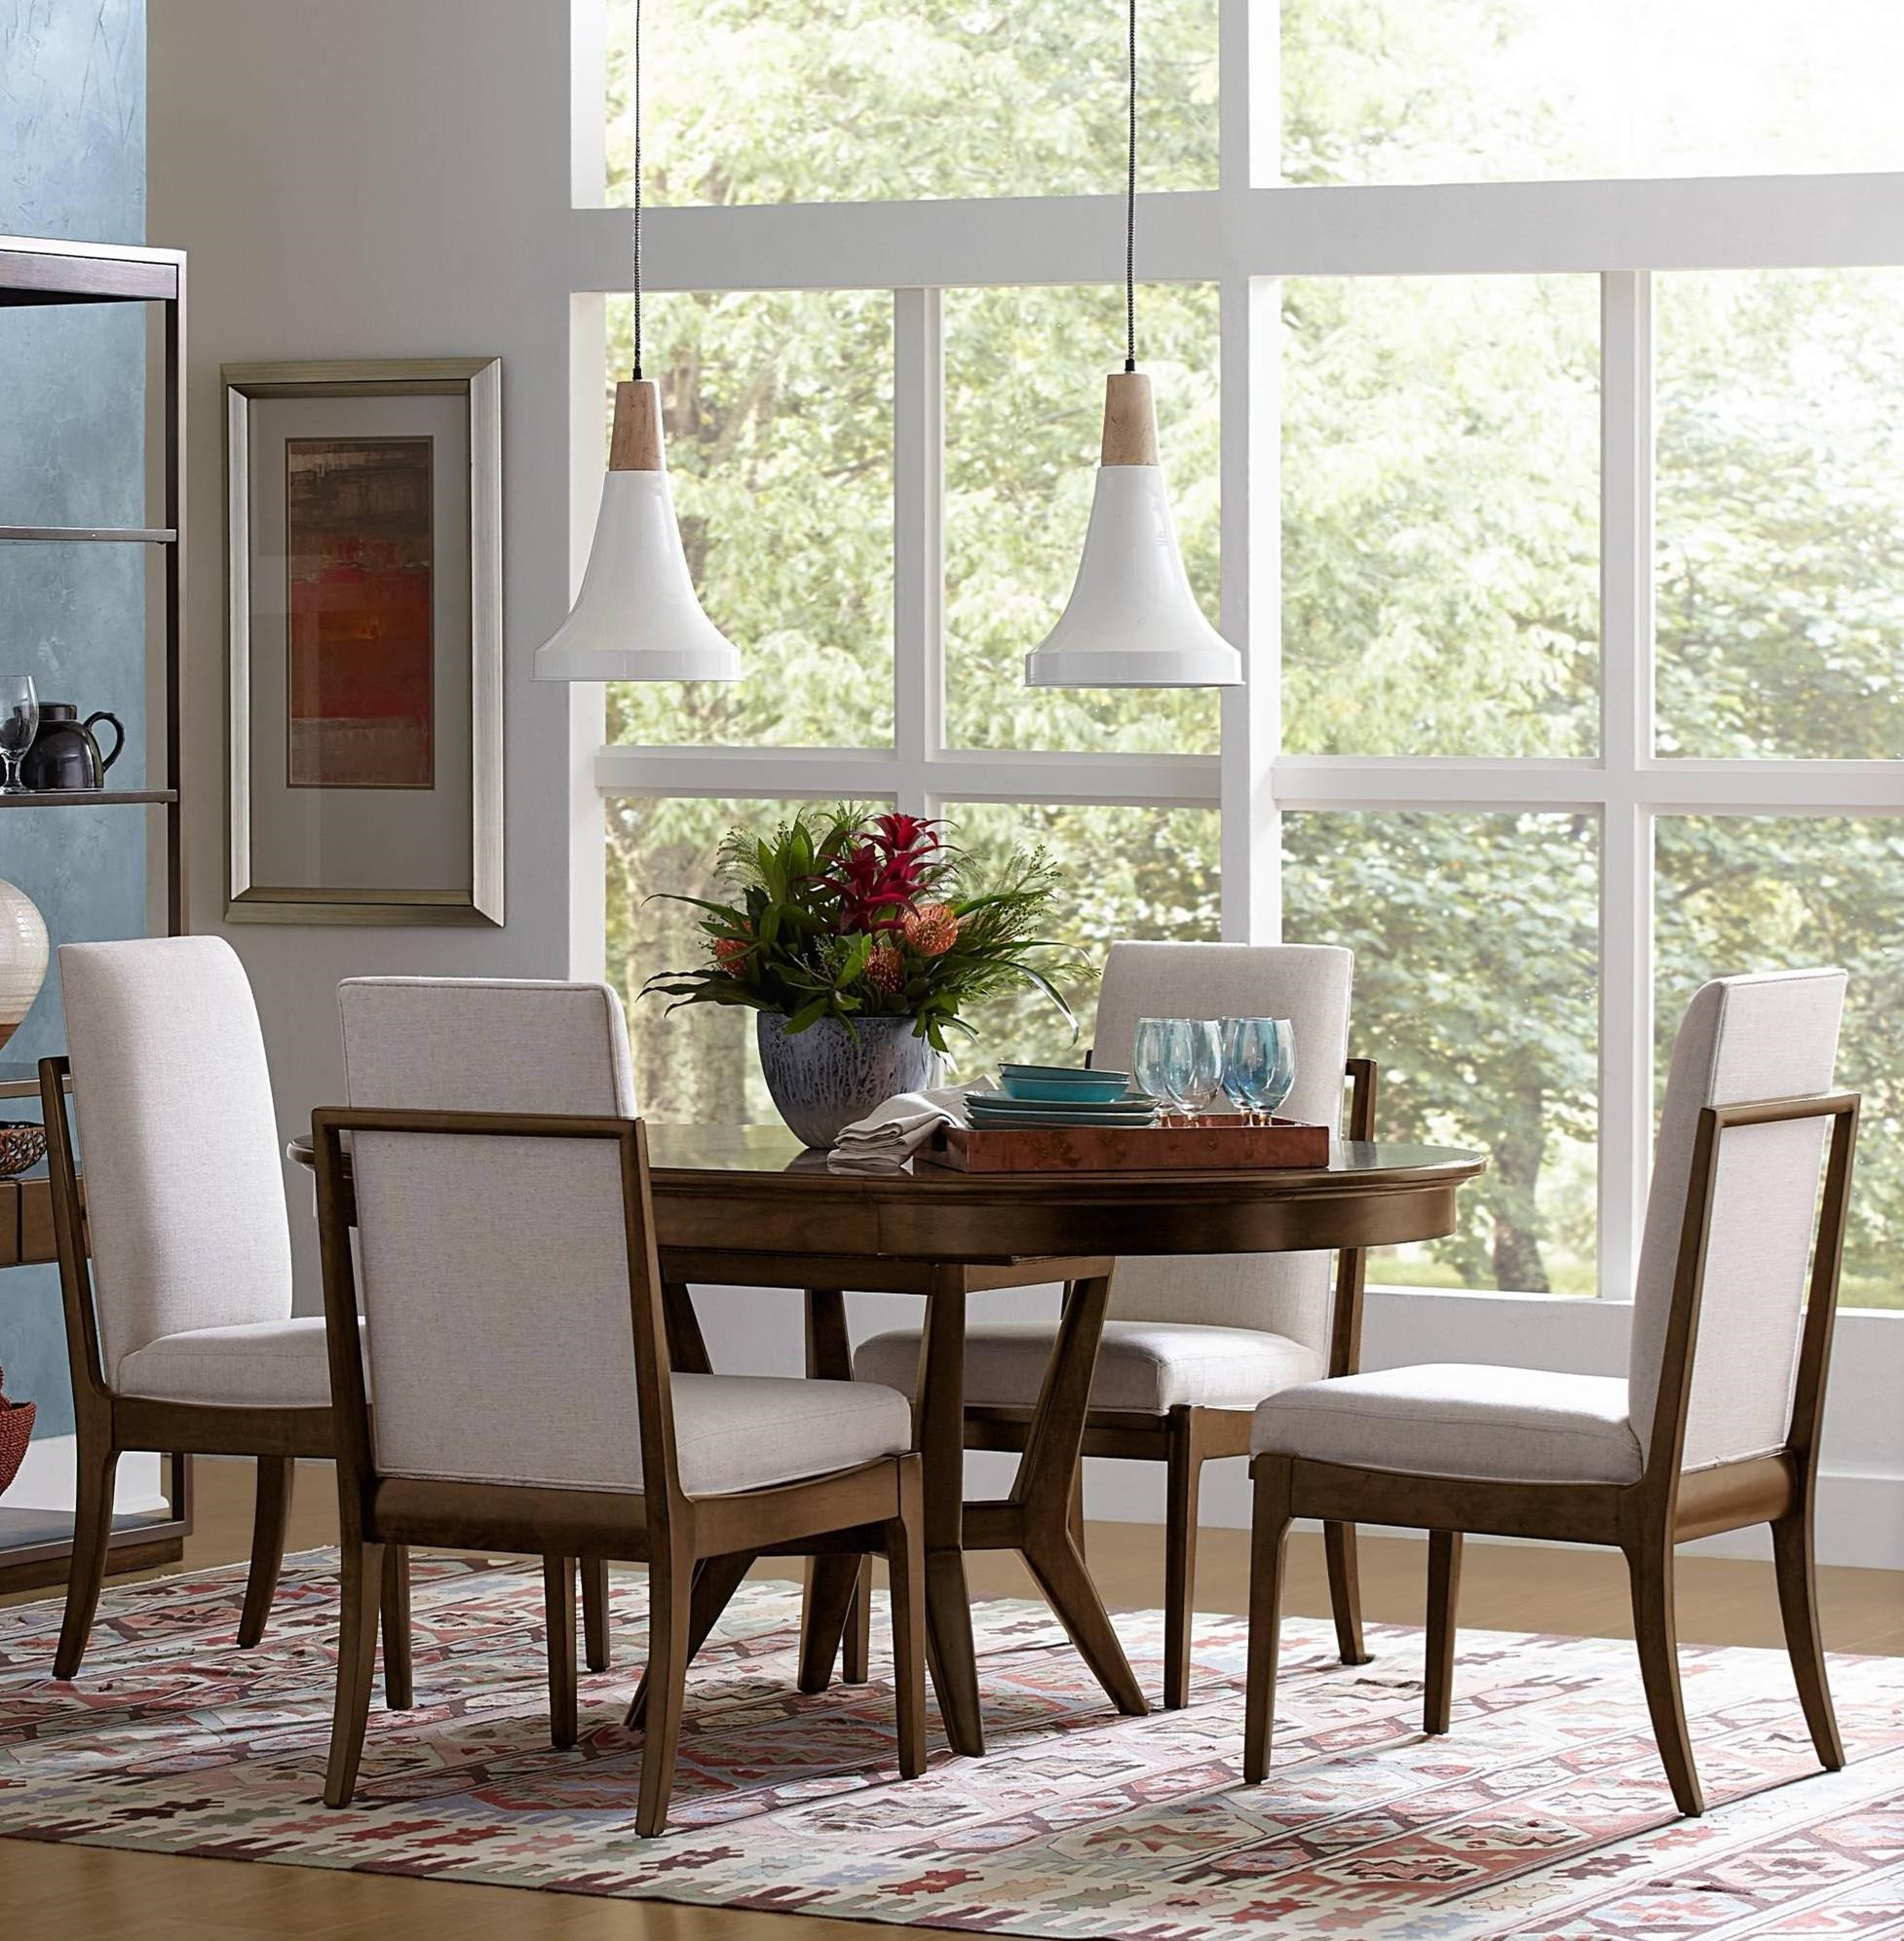 Stanley furniture santa clara 5 piece round table set for Stanley furniture dining room sets